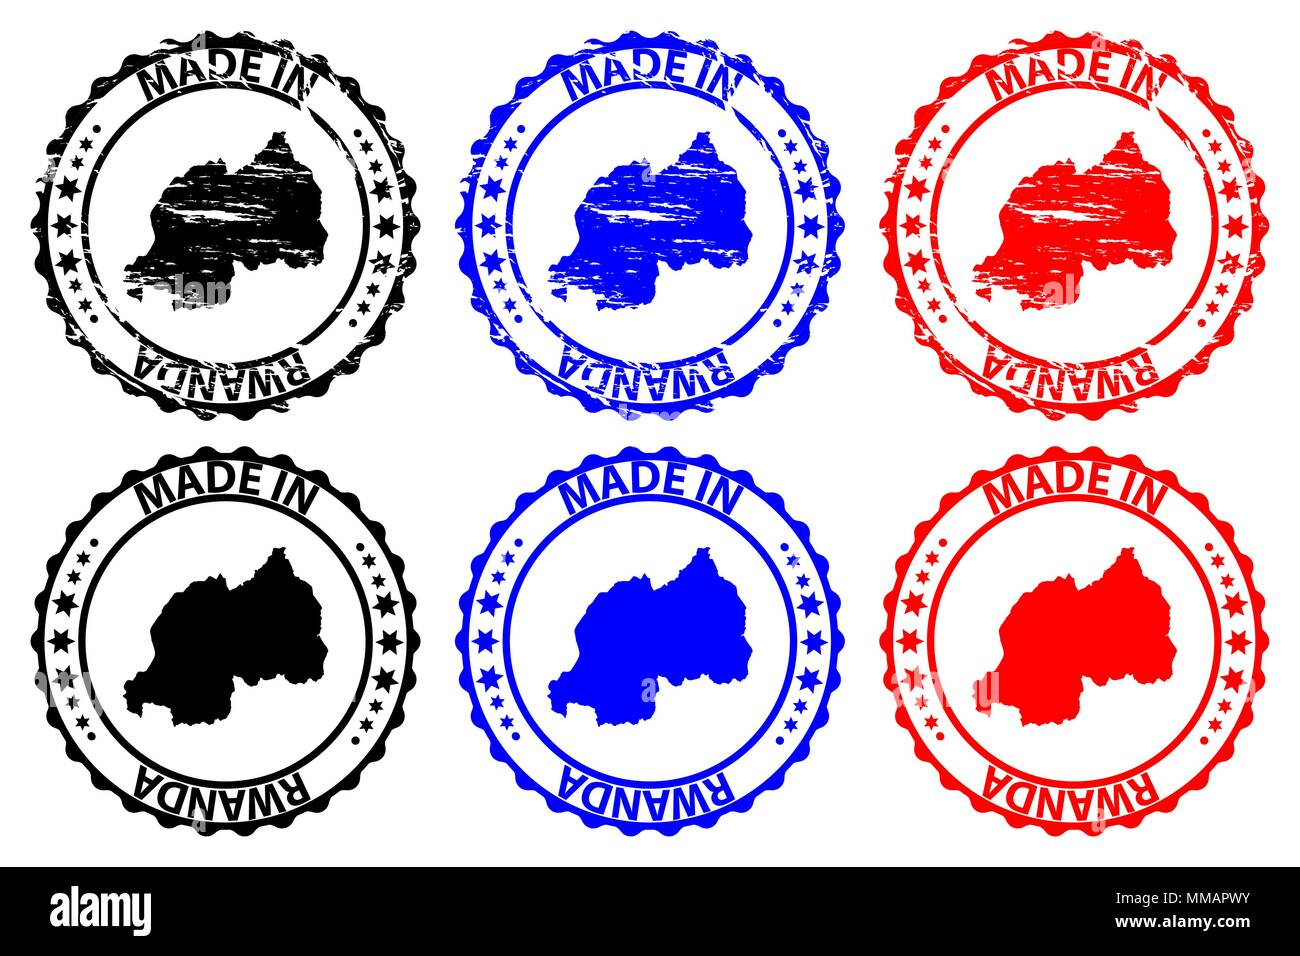 Made in Rwanda - rubber stamp - vector, Rwanda map pattern - black, blue and red - Stock Vector